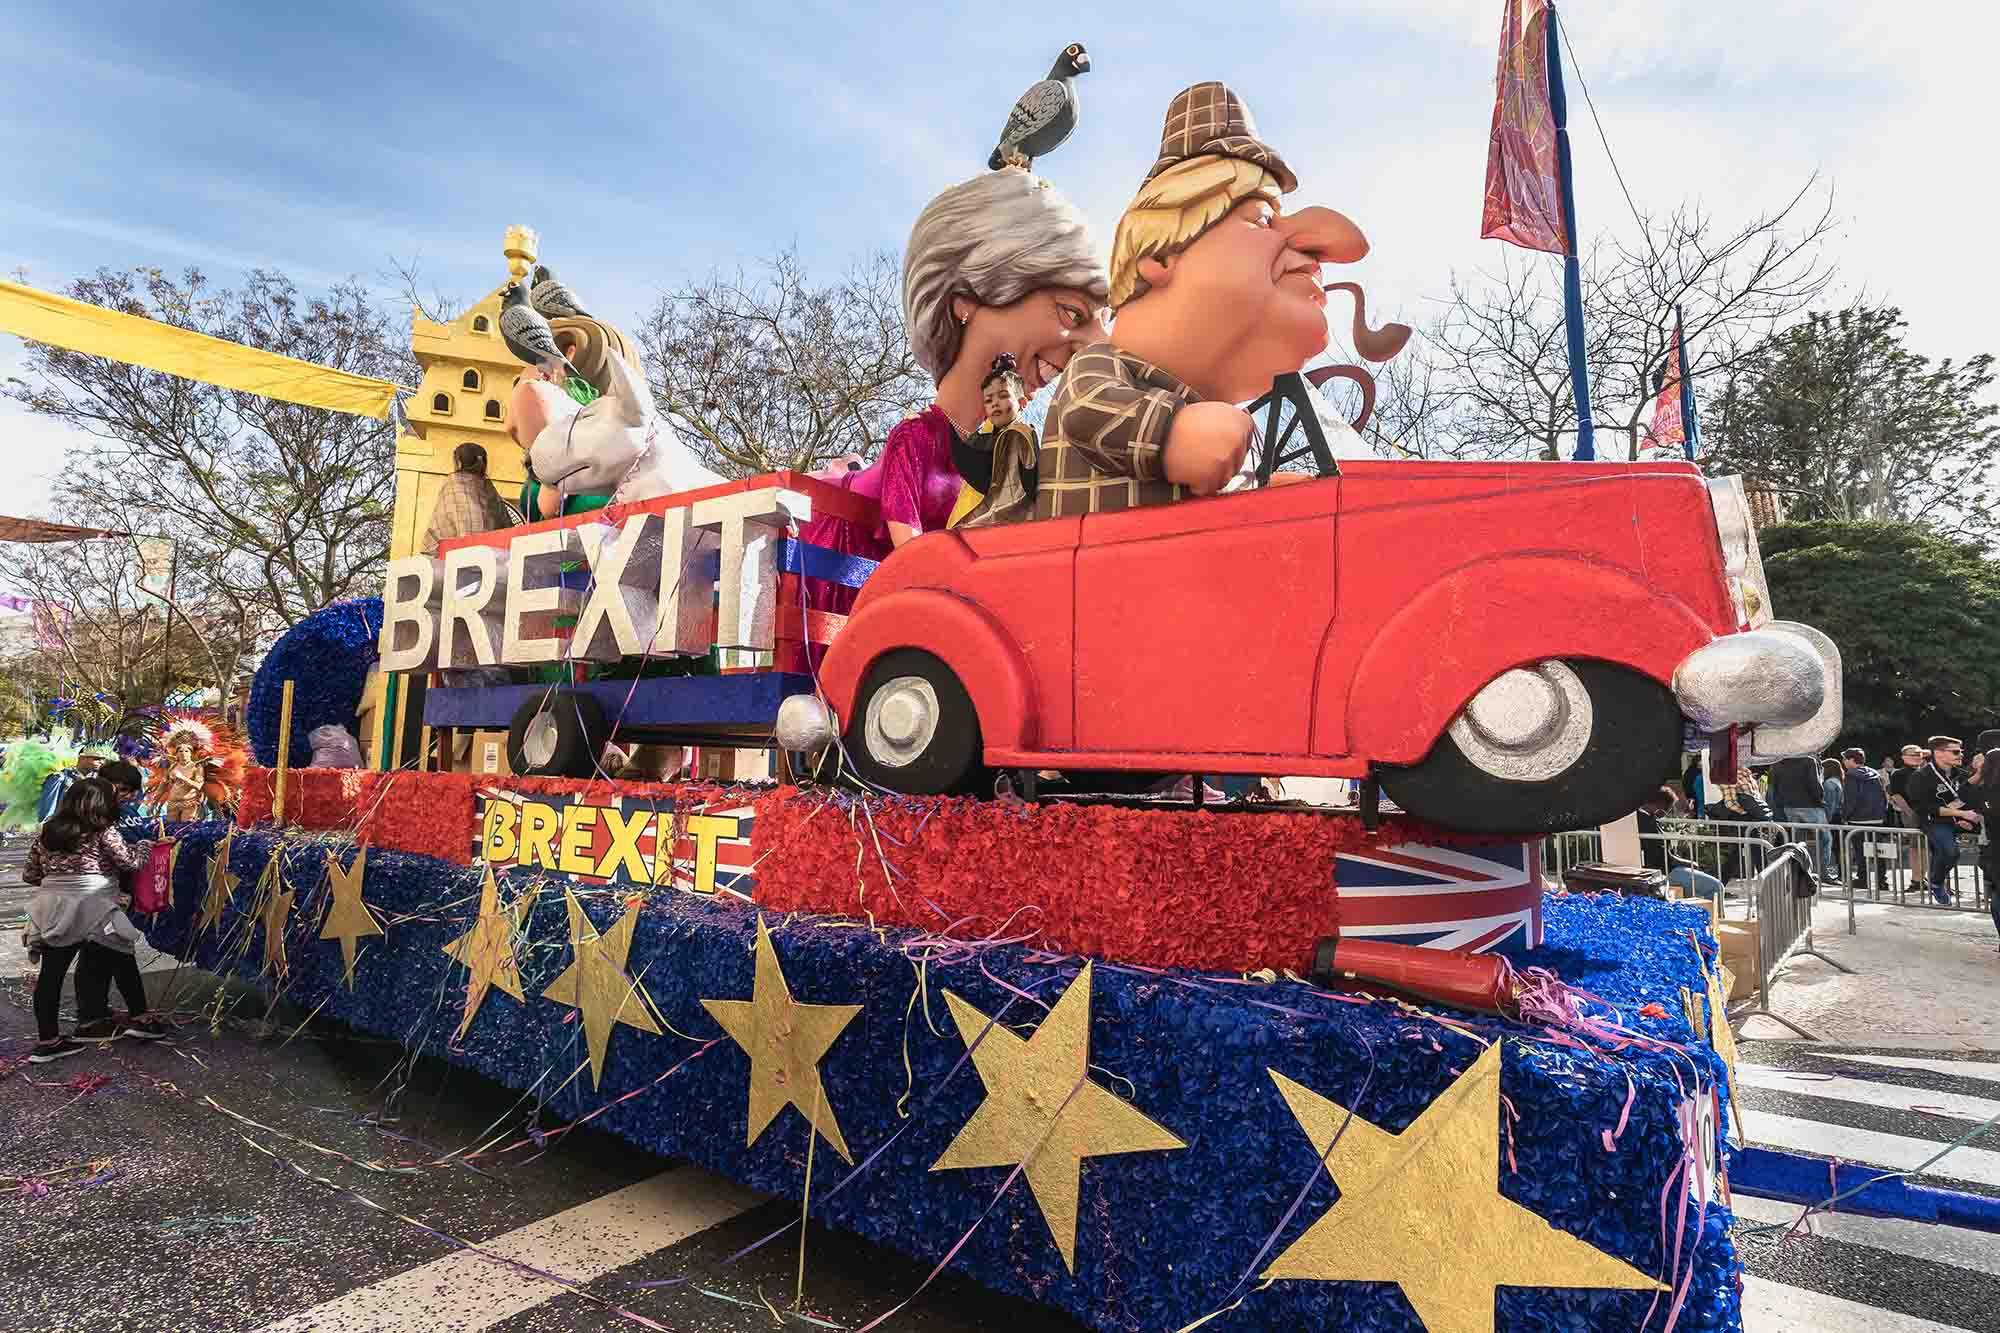 brexit float at loule carnaval